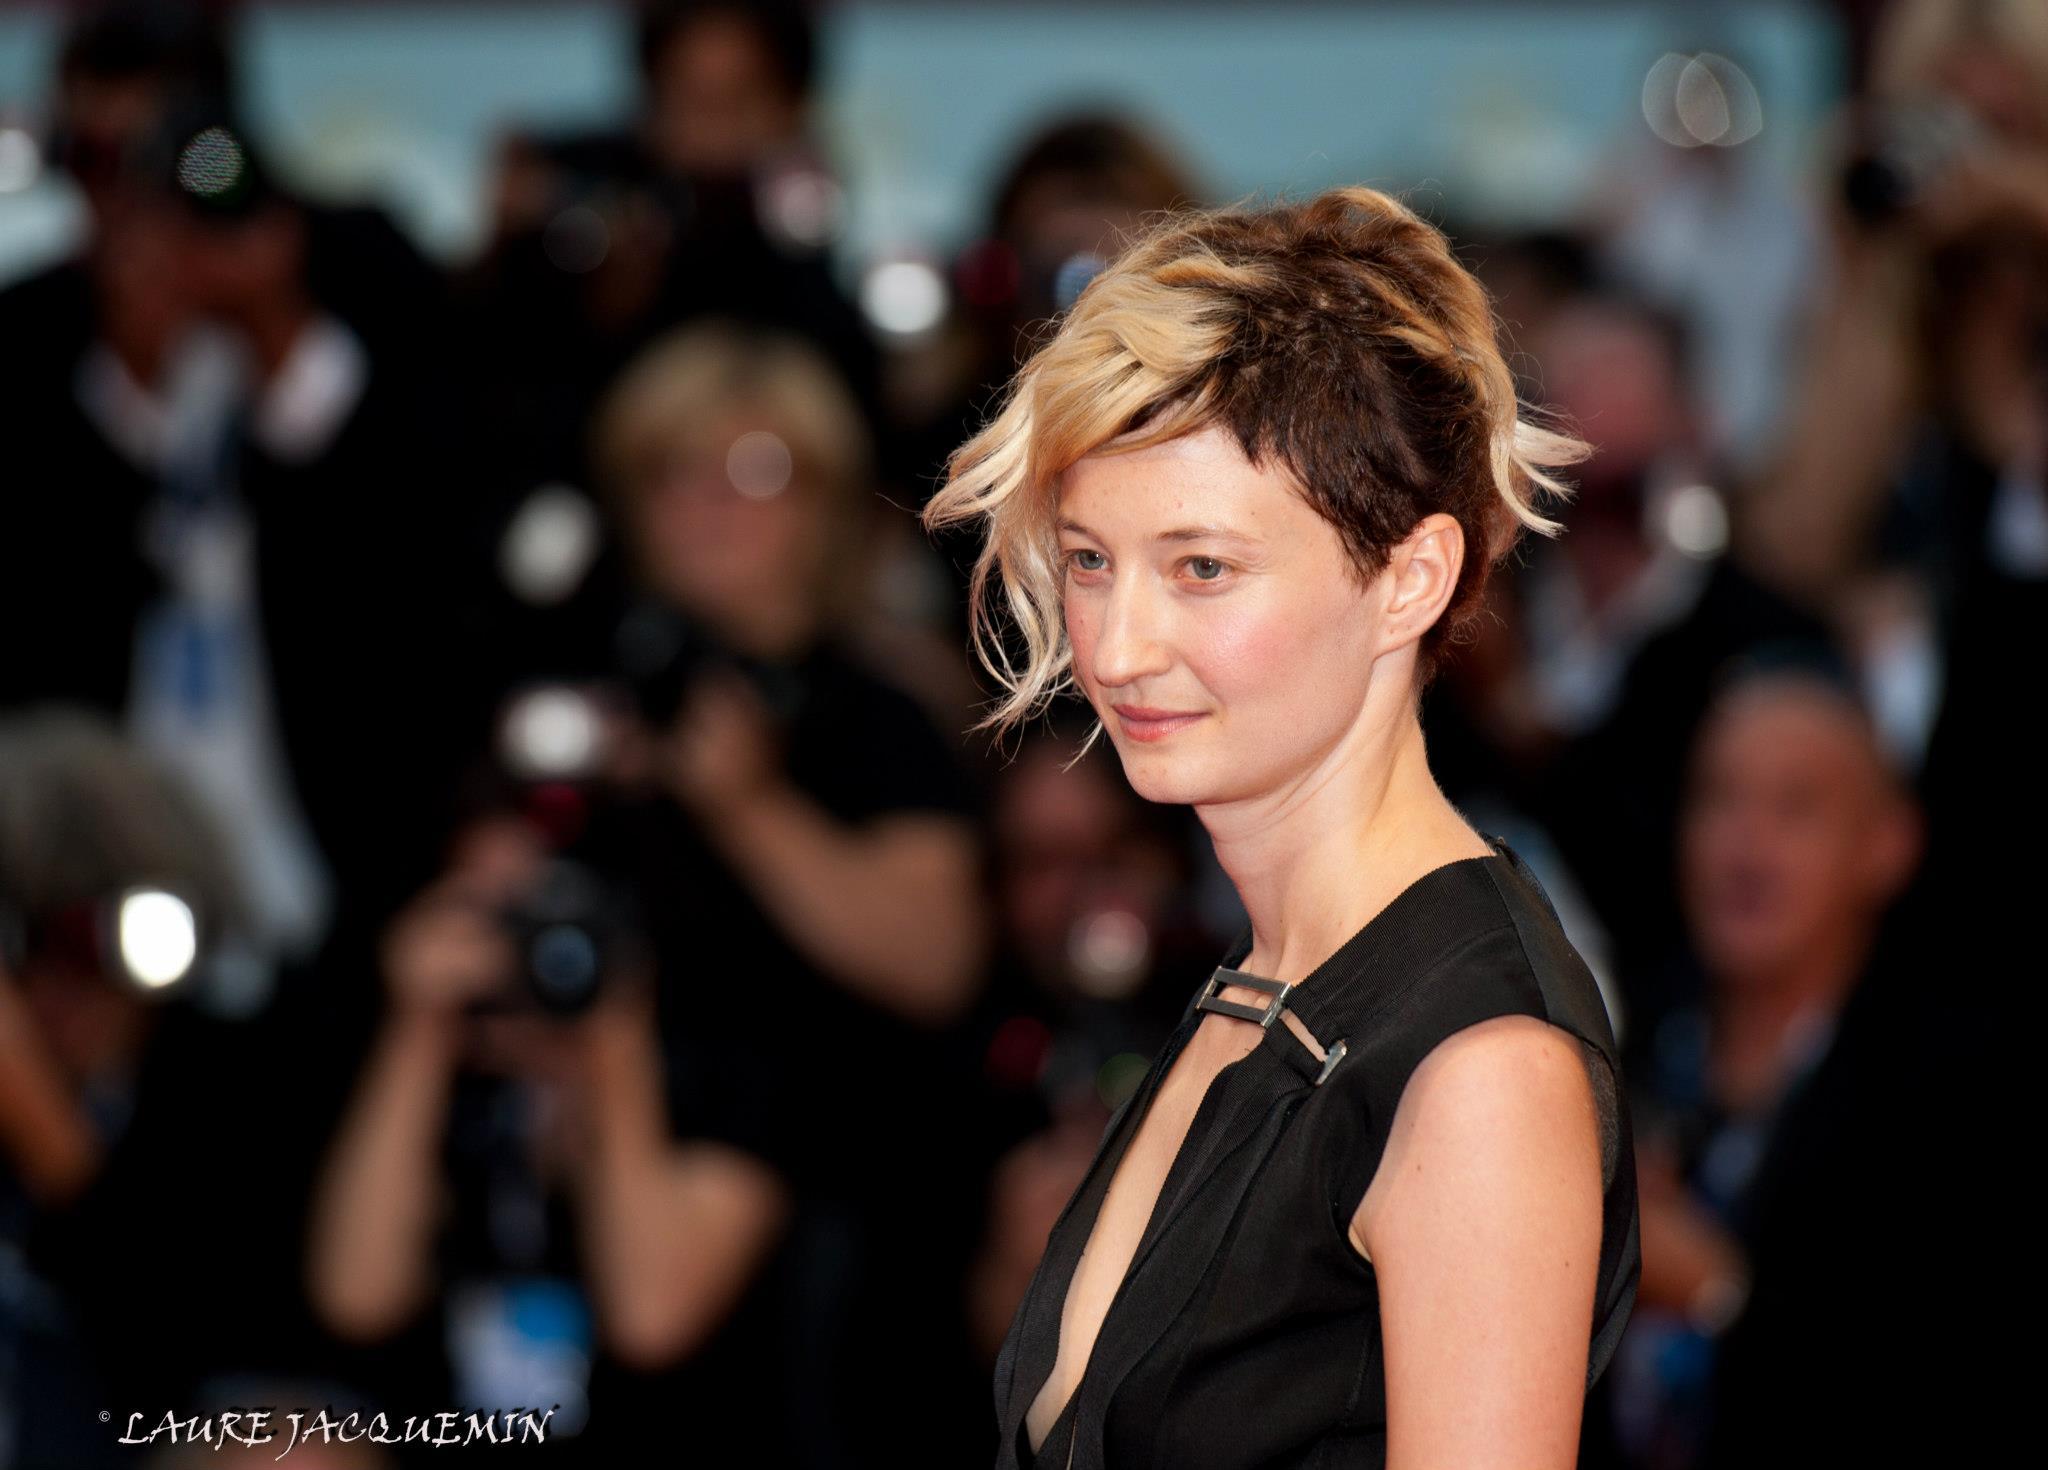 mostra+del+cinema+laure+jacquemin+venise+photographe+(3).jpg